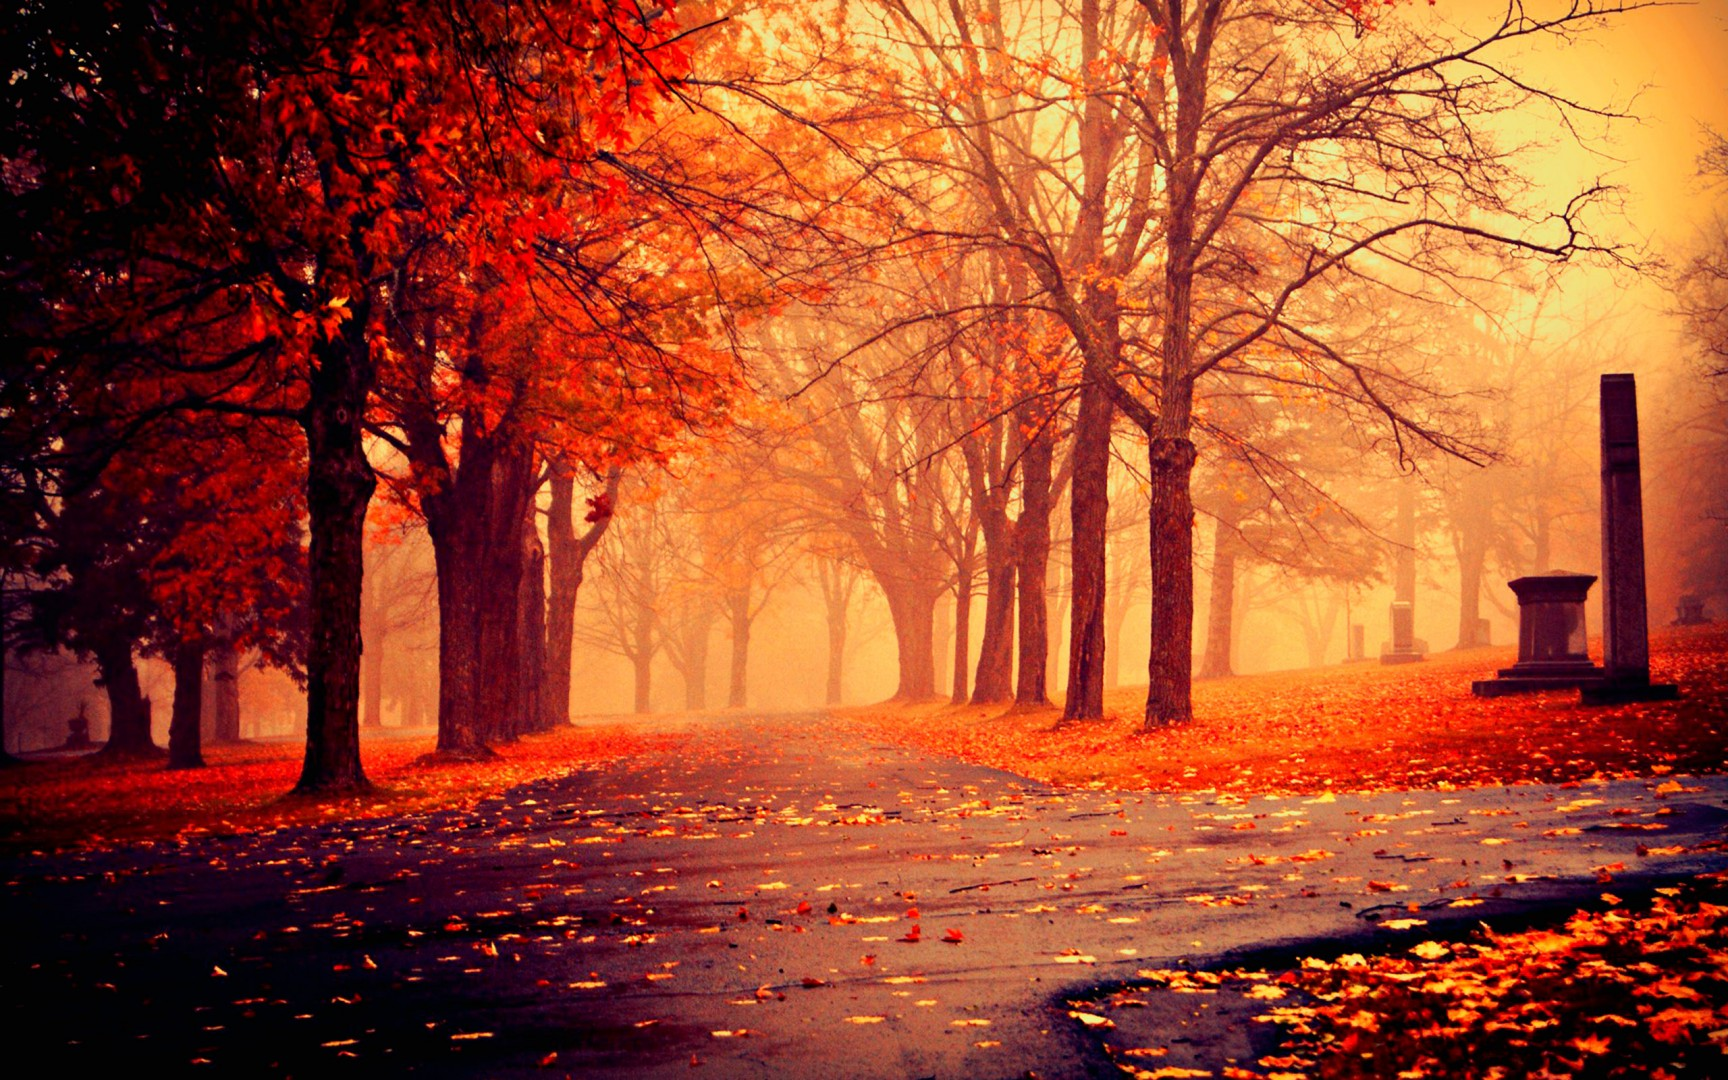 autumn season wallpaper 3966 hdwpro